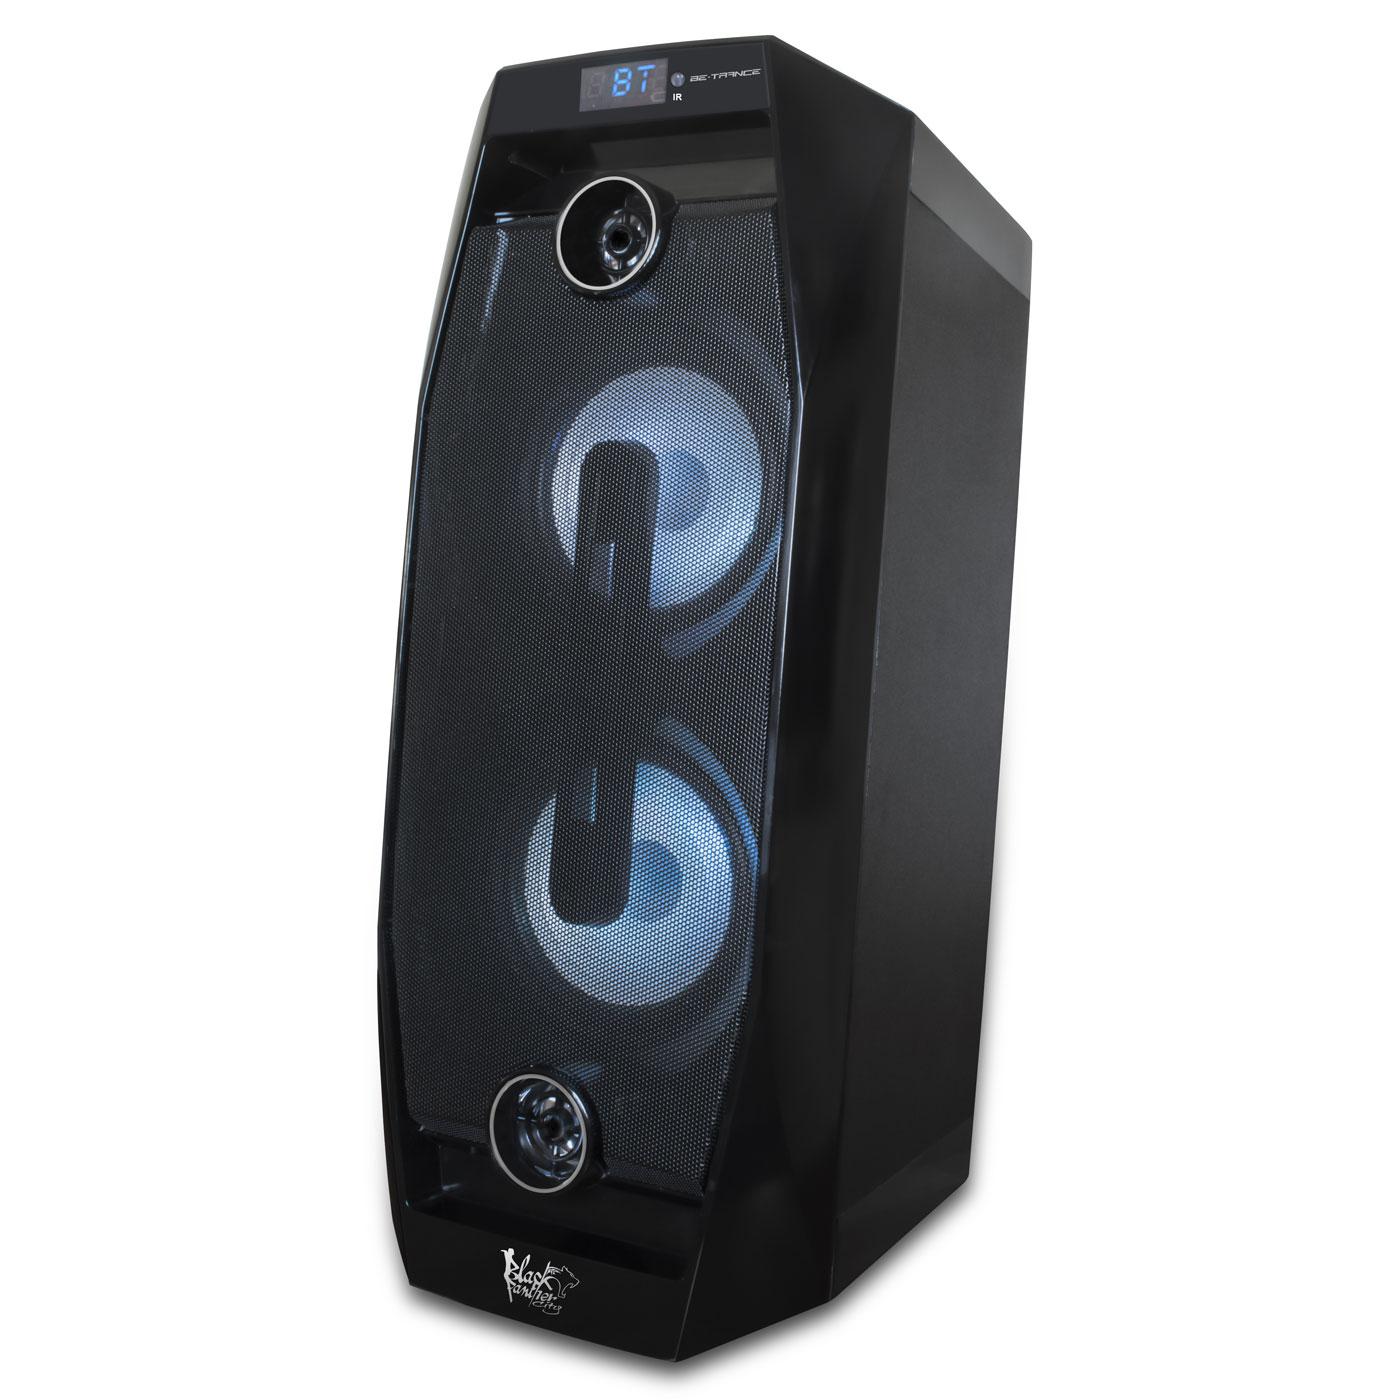 Dock & Enceinte Bluetooth Black Panther City Be-Trance Enceinte transportable sans fil Bluetooth avec USB, SD et micro karaoké